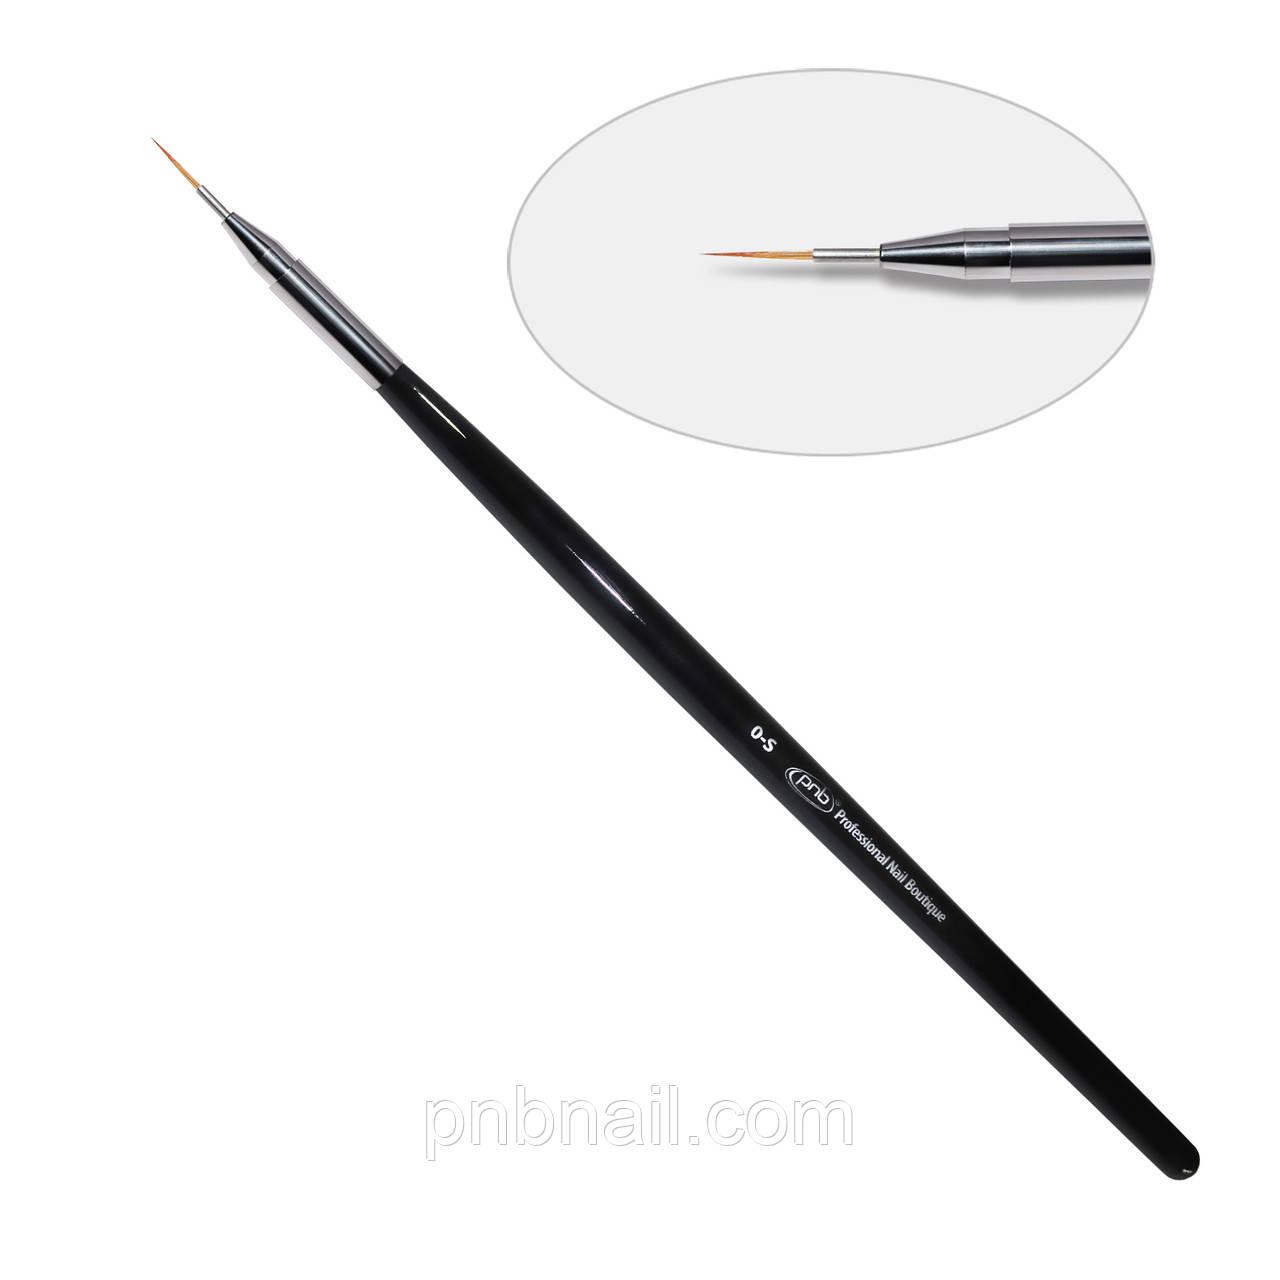 7D.Кисть для дизайна круглая 0-s PNB, нейлон /Gel Brush round 0-s PNB,nylon